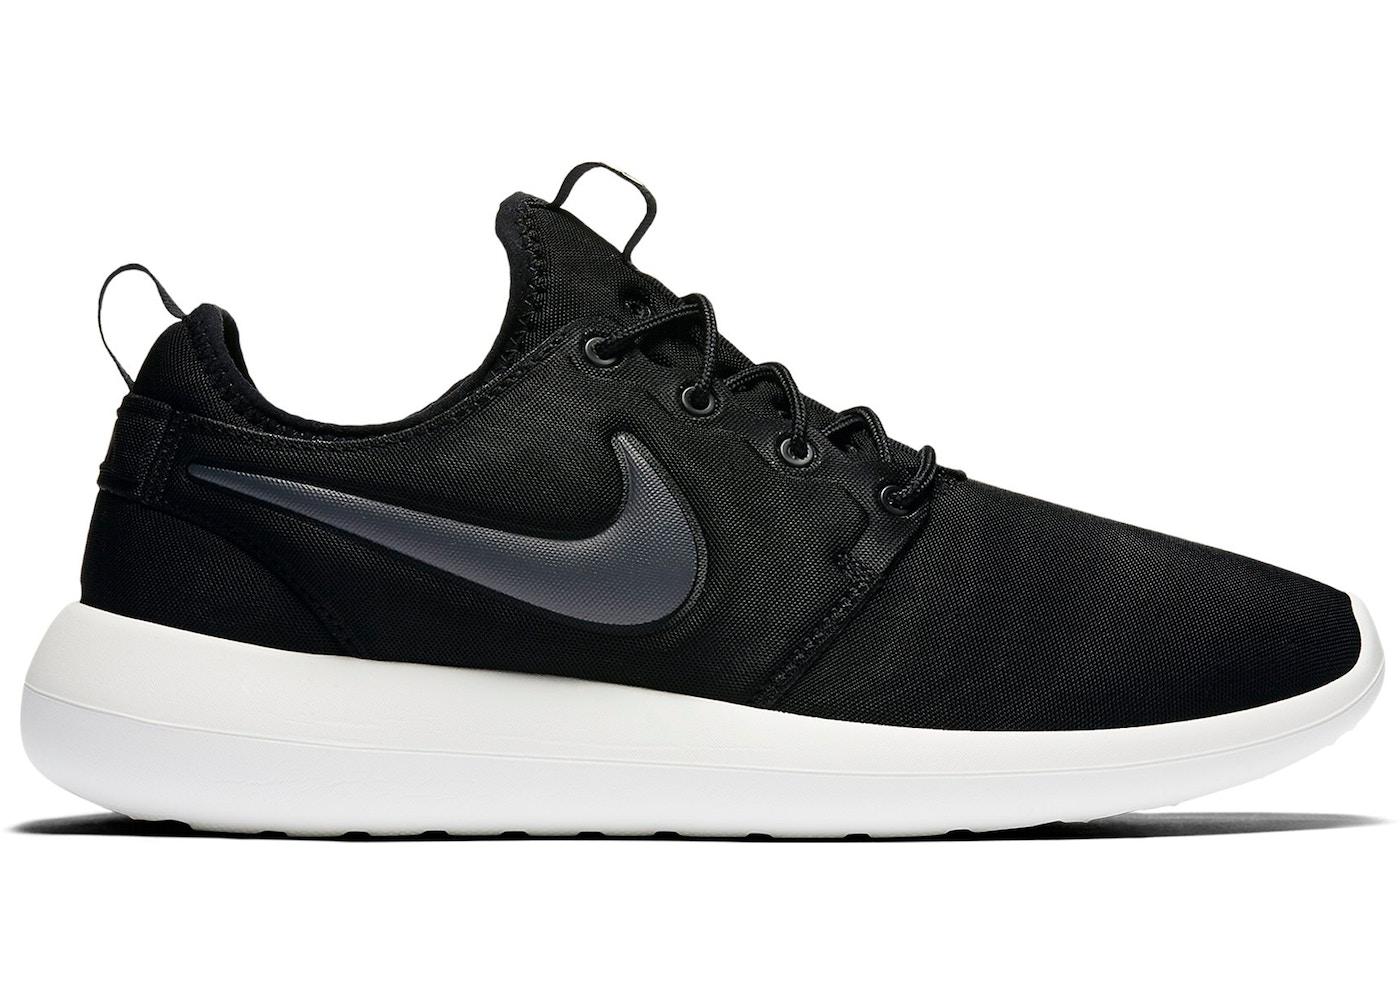 sports shoes 87bdb 9f814 Nike Roshe 2 Black Anthracite